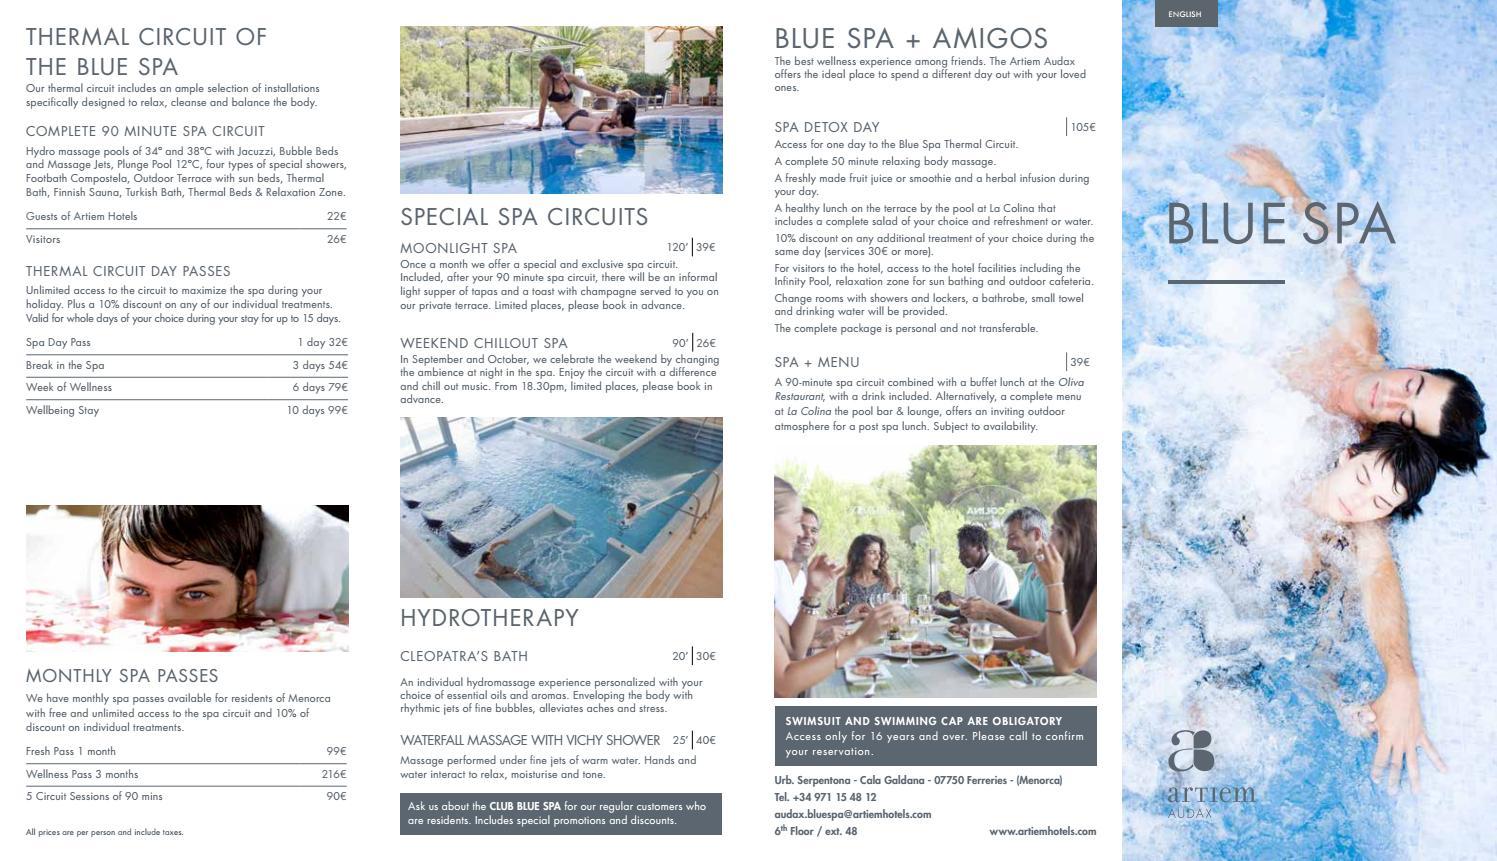 Artiem audax blue spa tratamientos eng by @ARTIEM - issuu